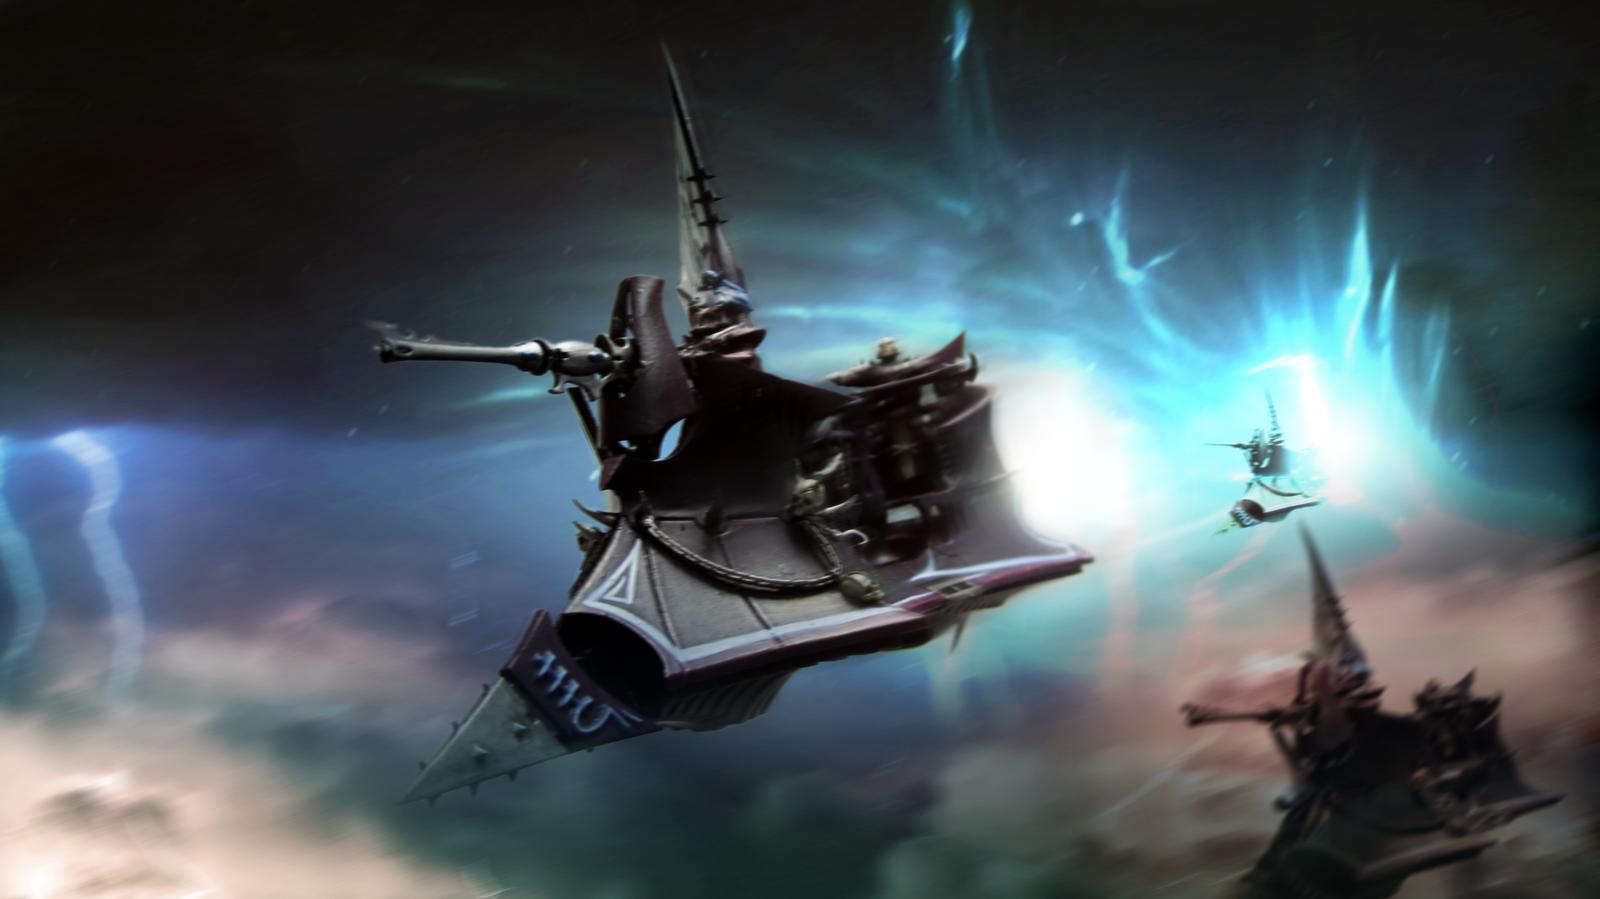 Warhammer 40k - Magazine cover